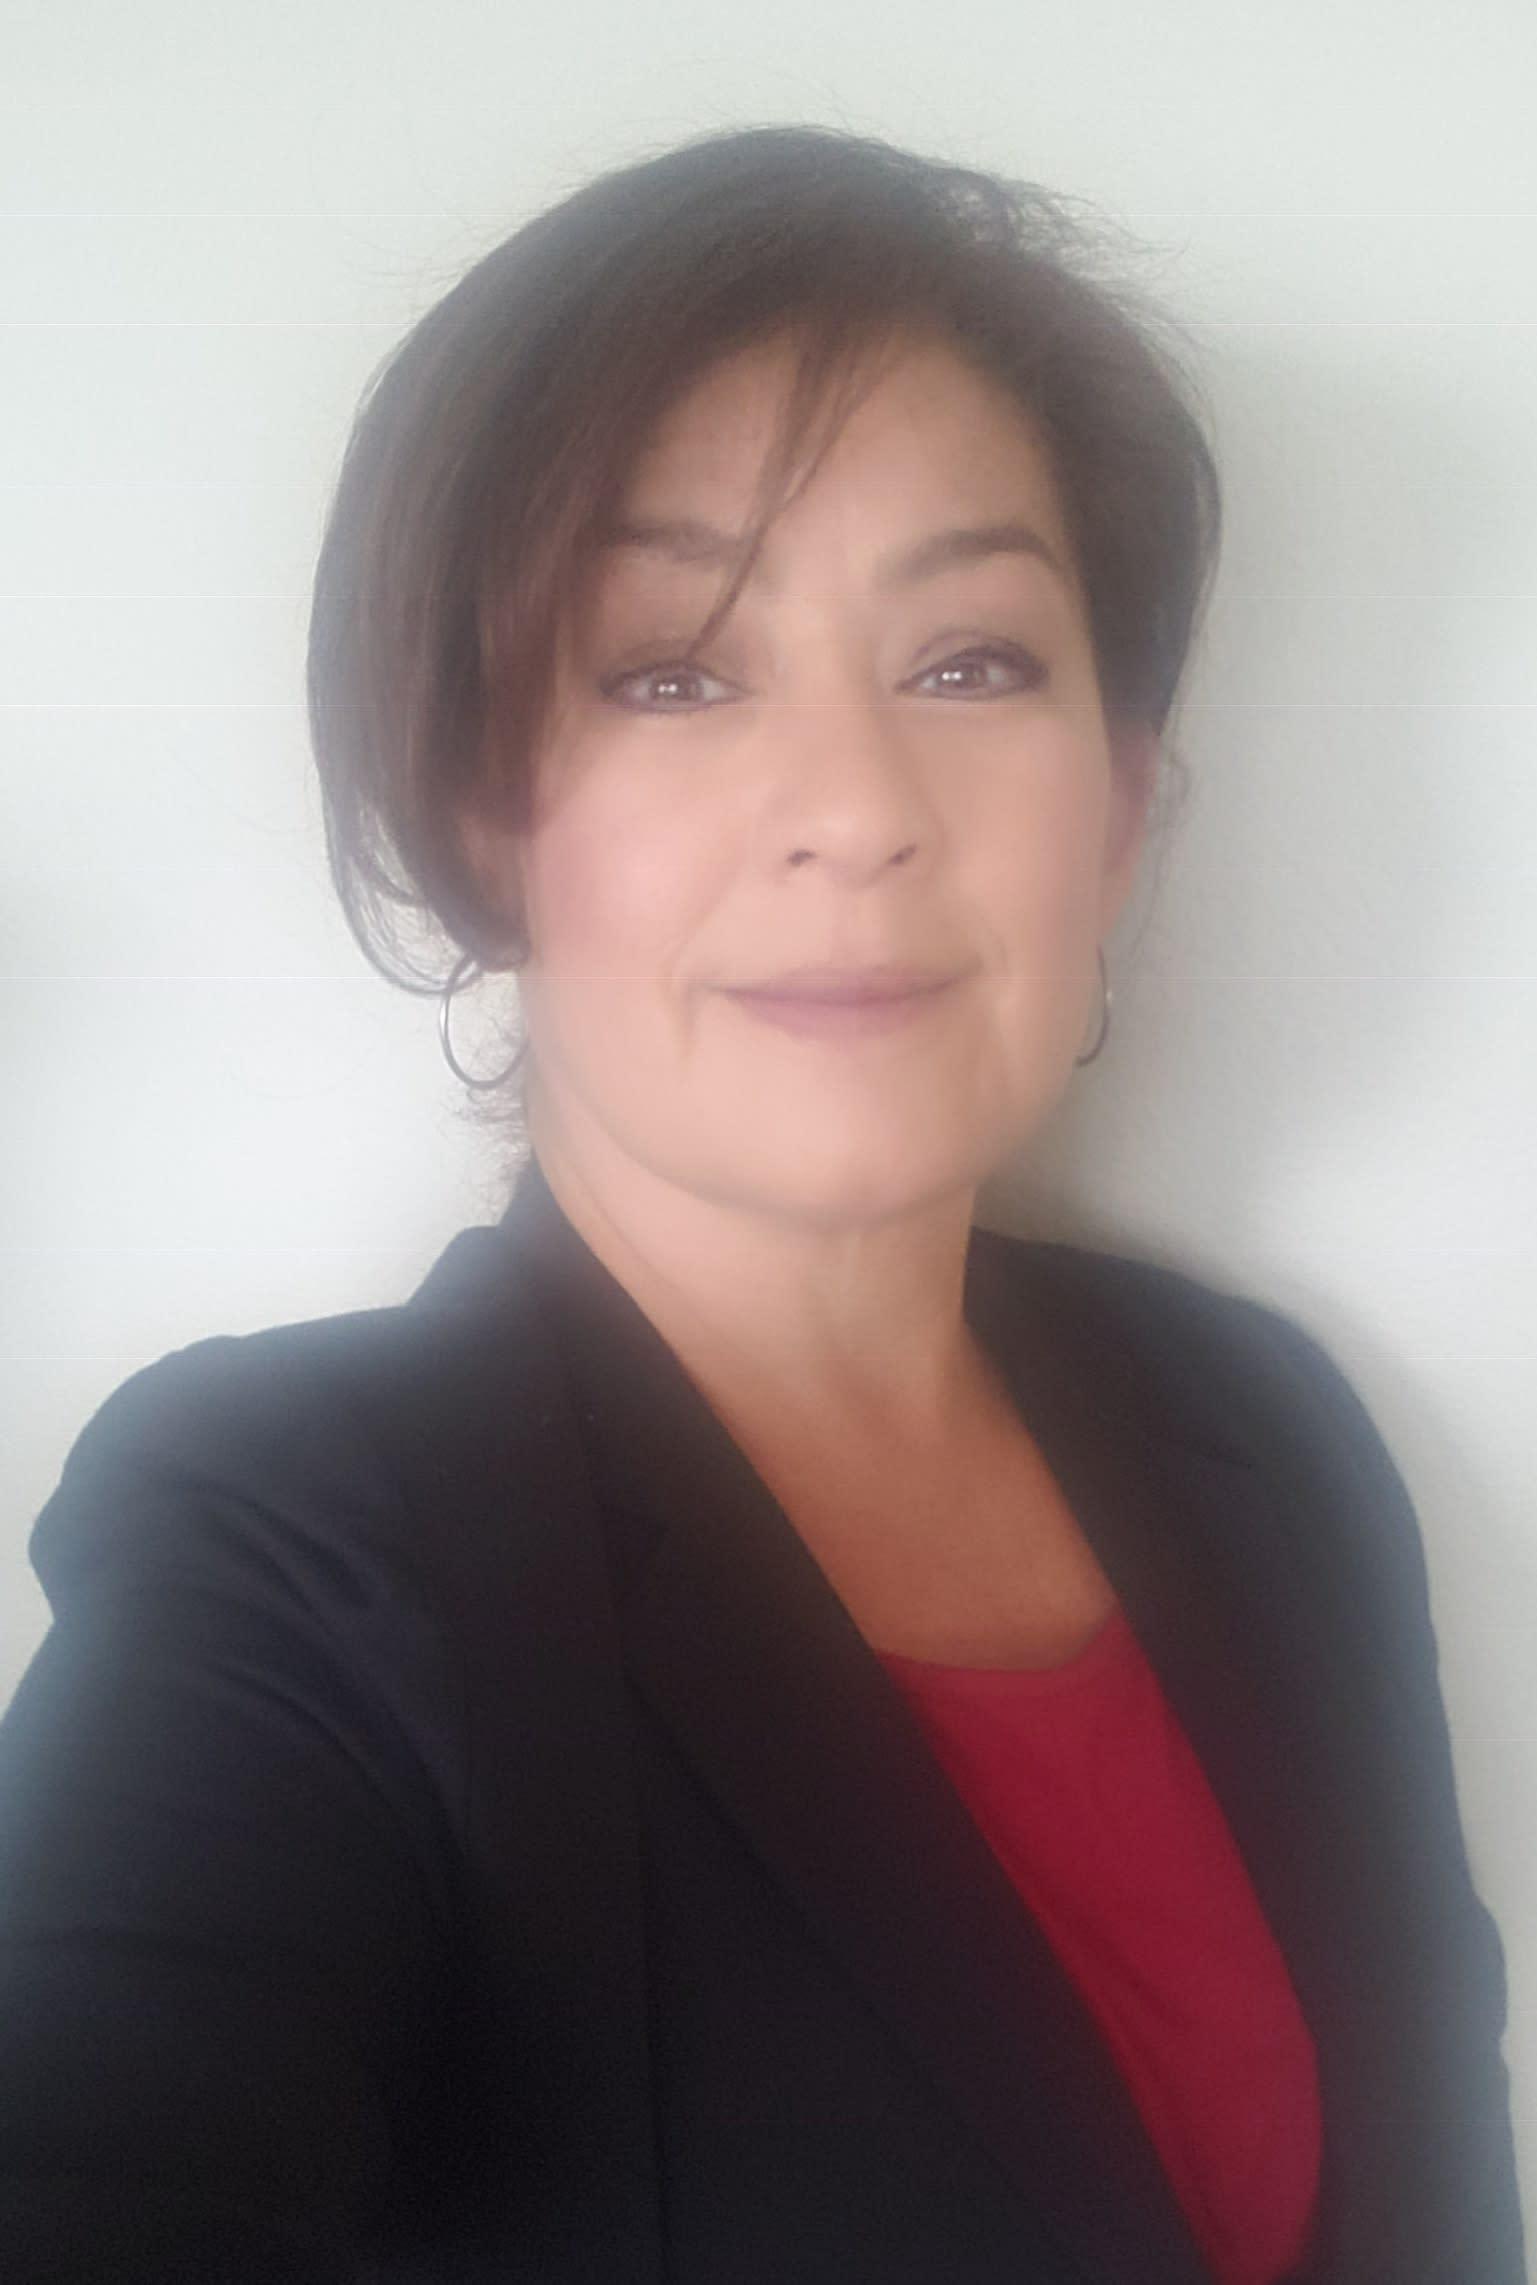 Guadalupe Alejandro